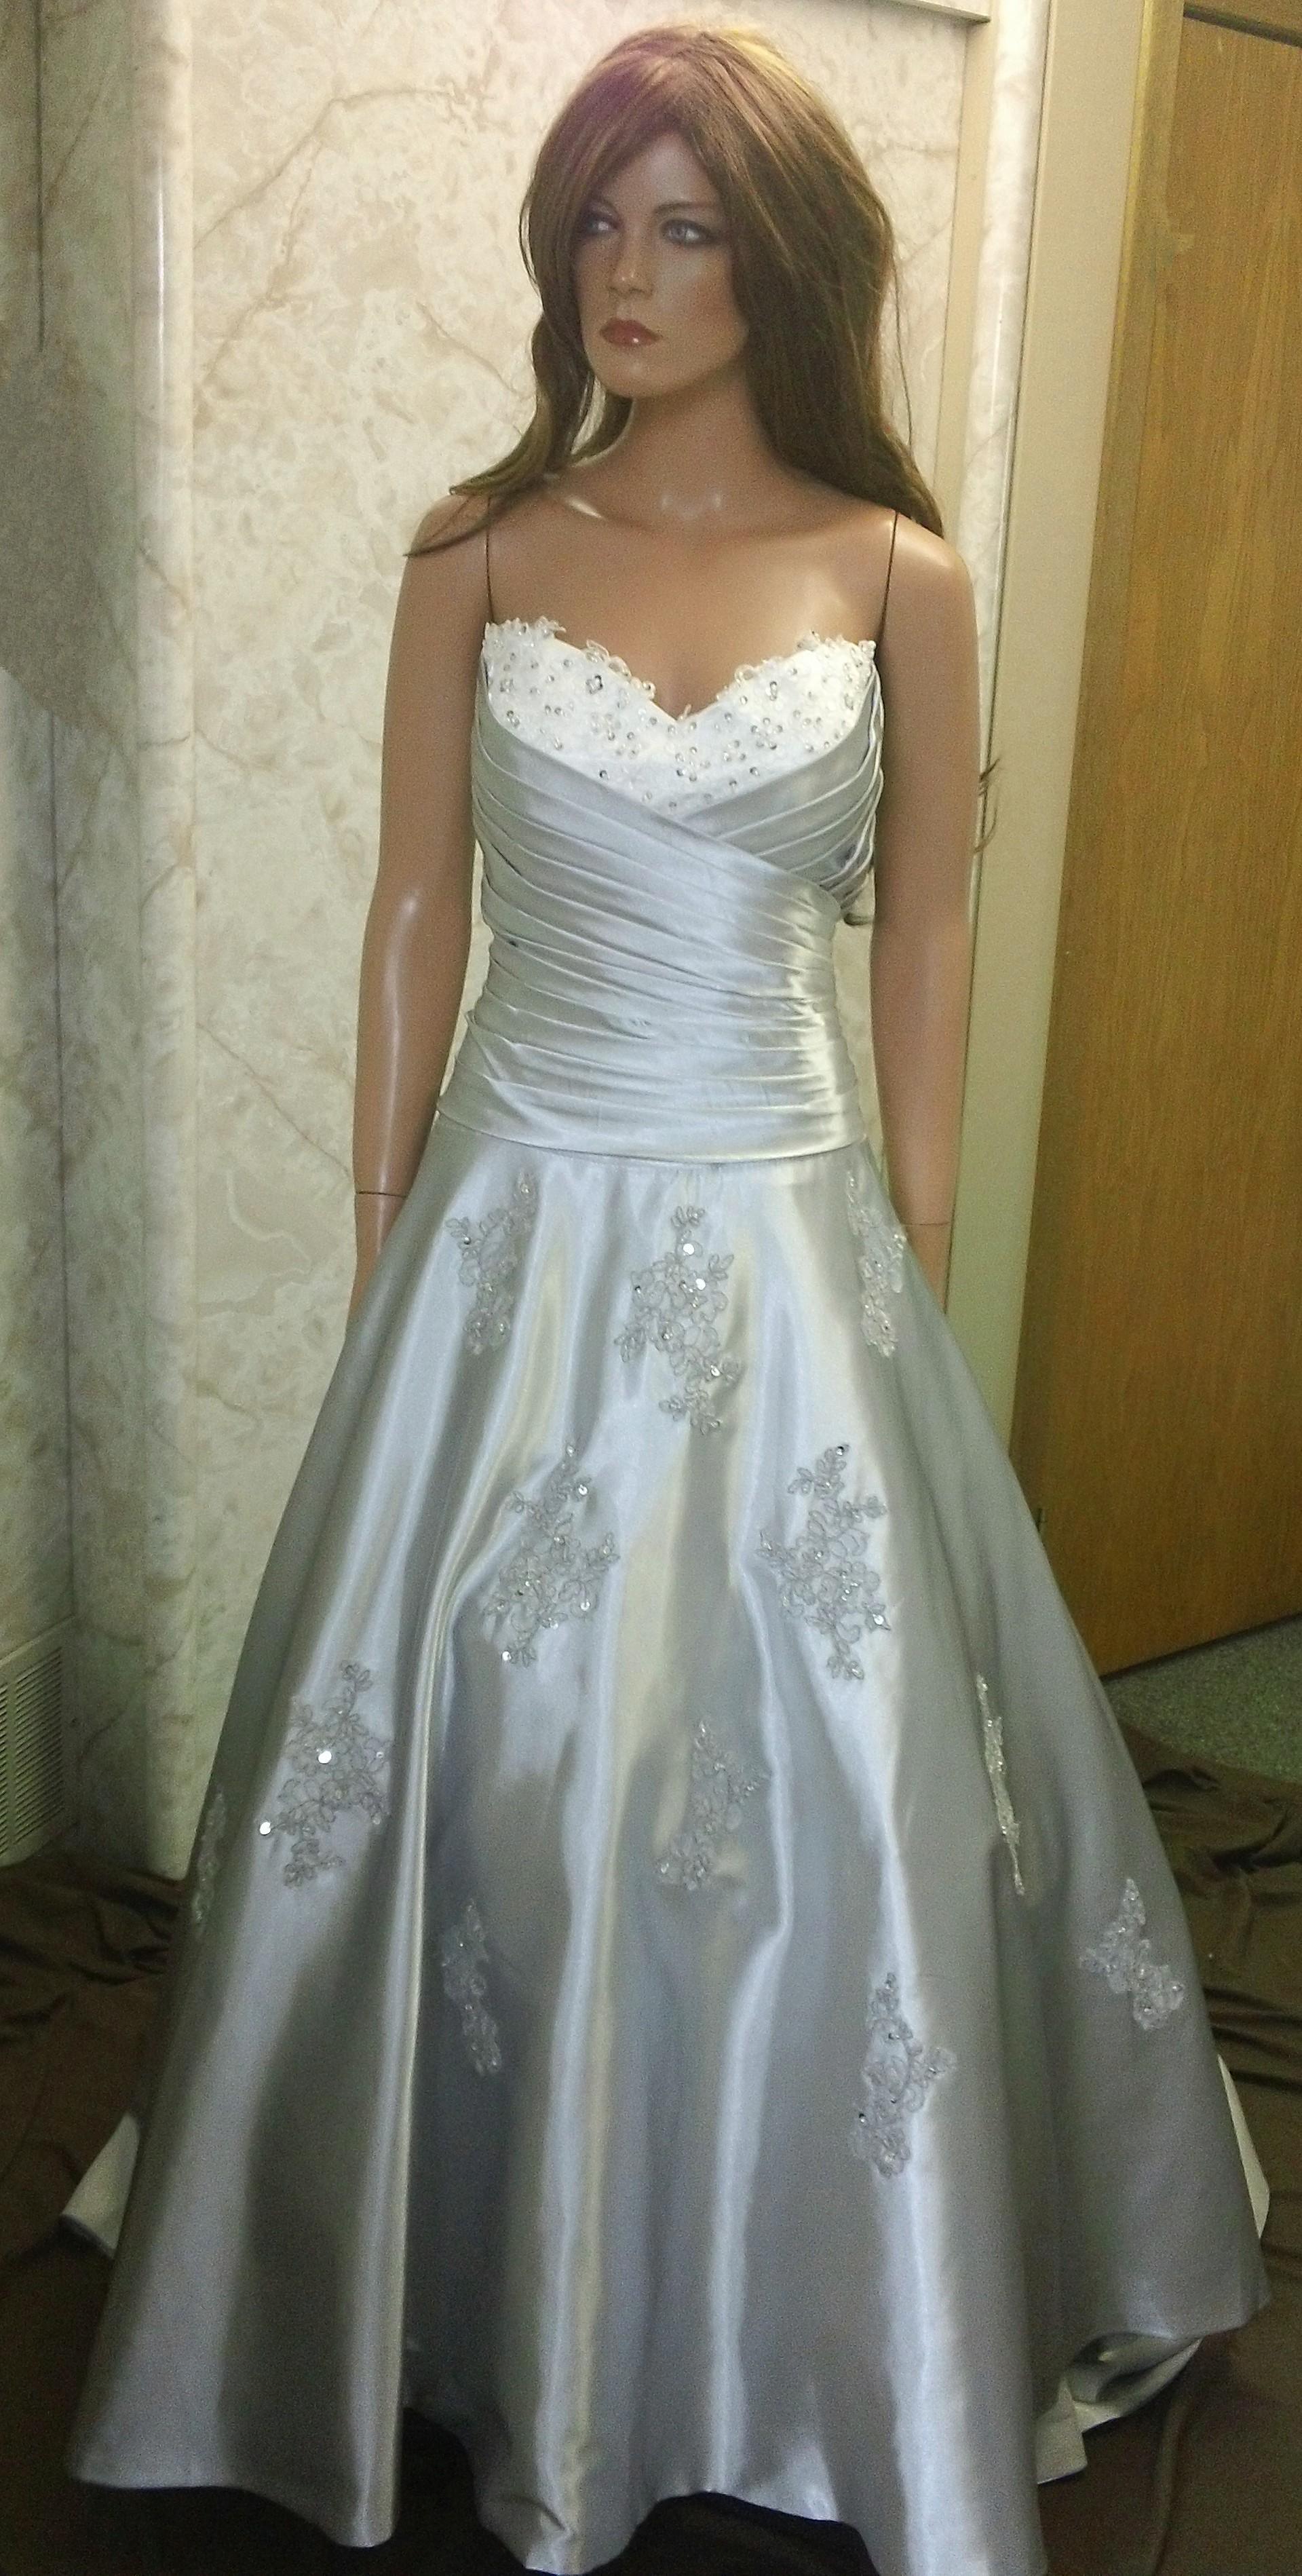 Silver and white draped bodice wedding dress.